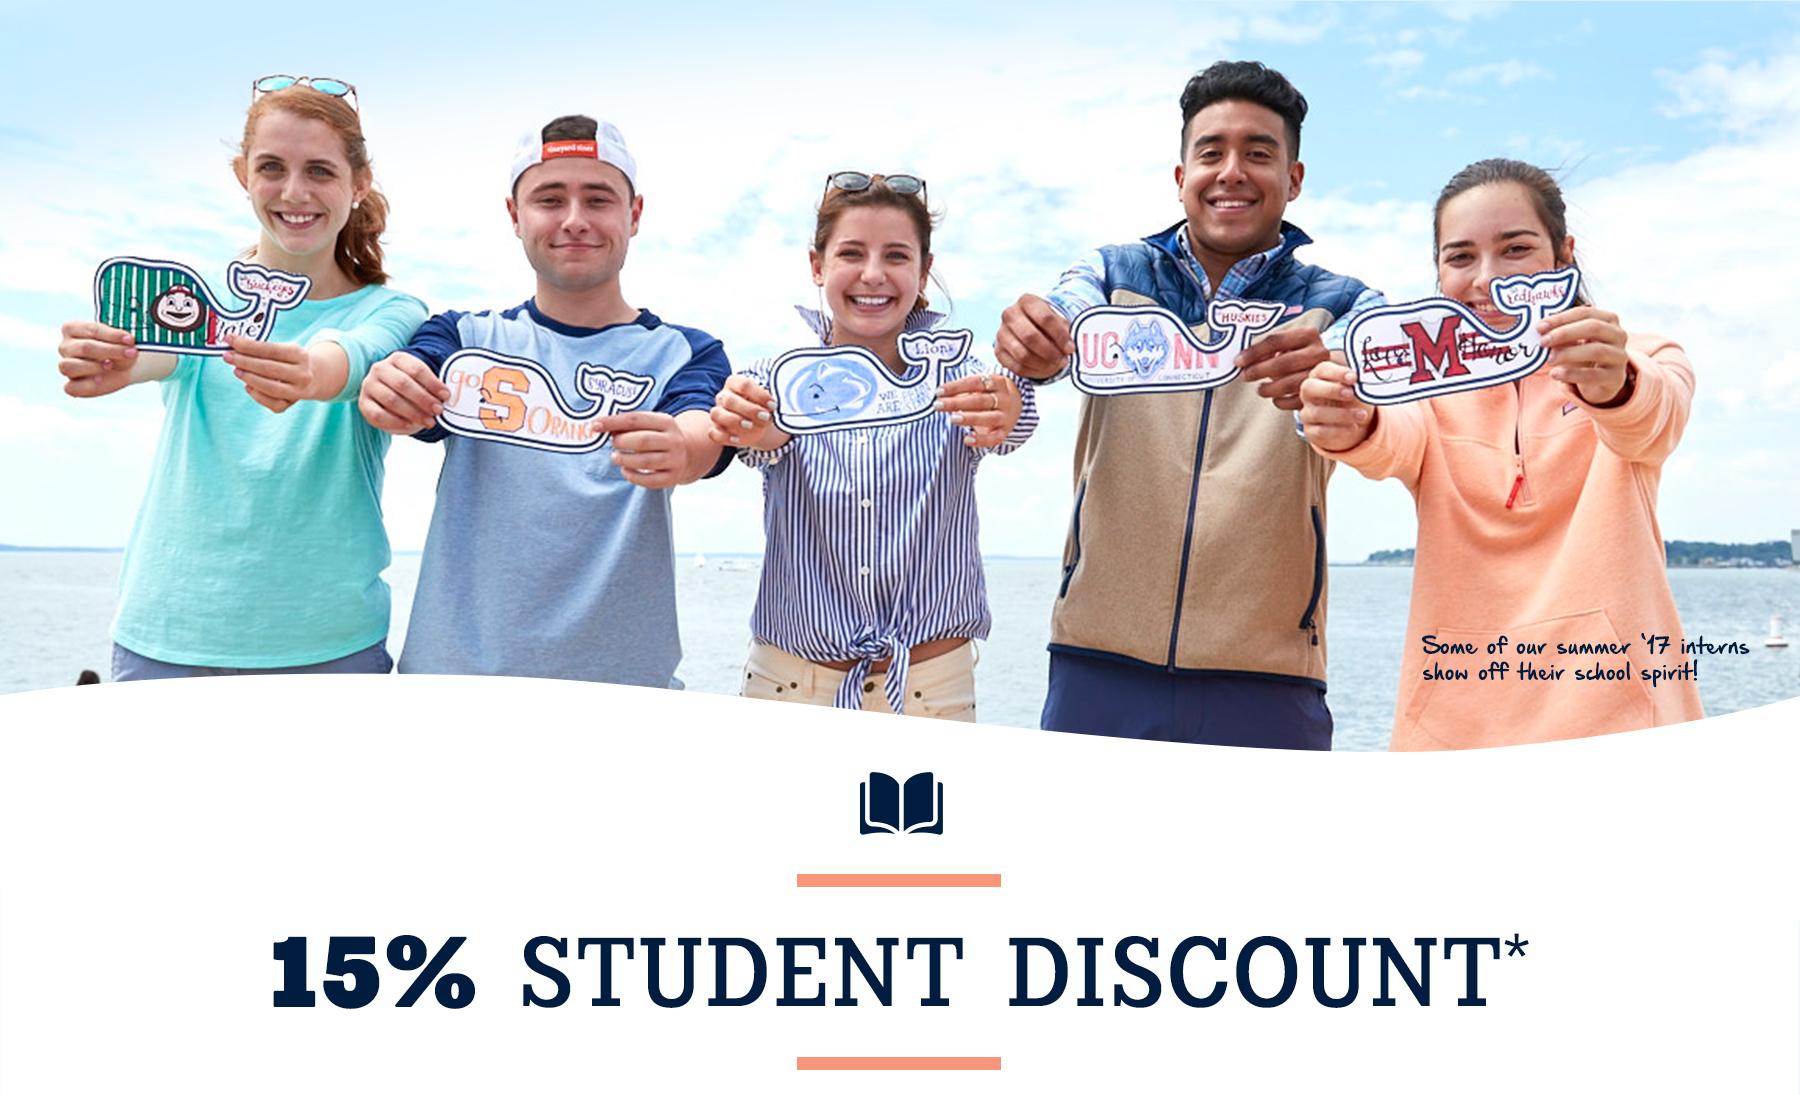 15% Student Discount.